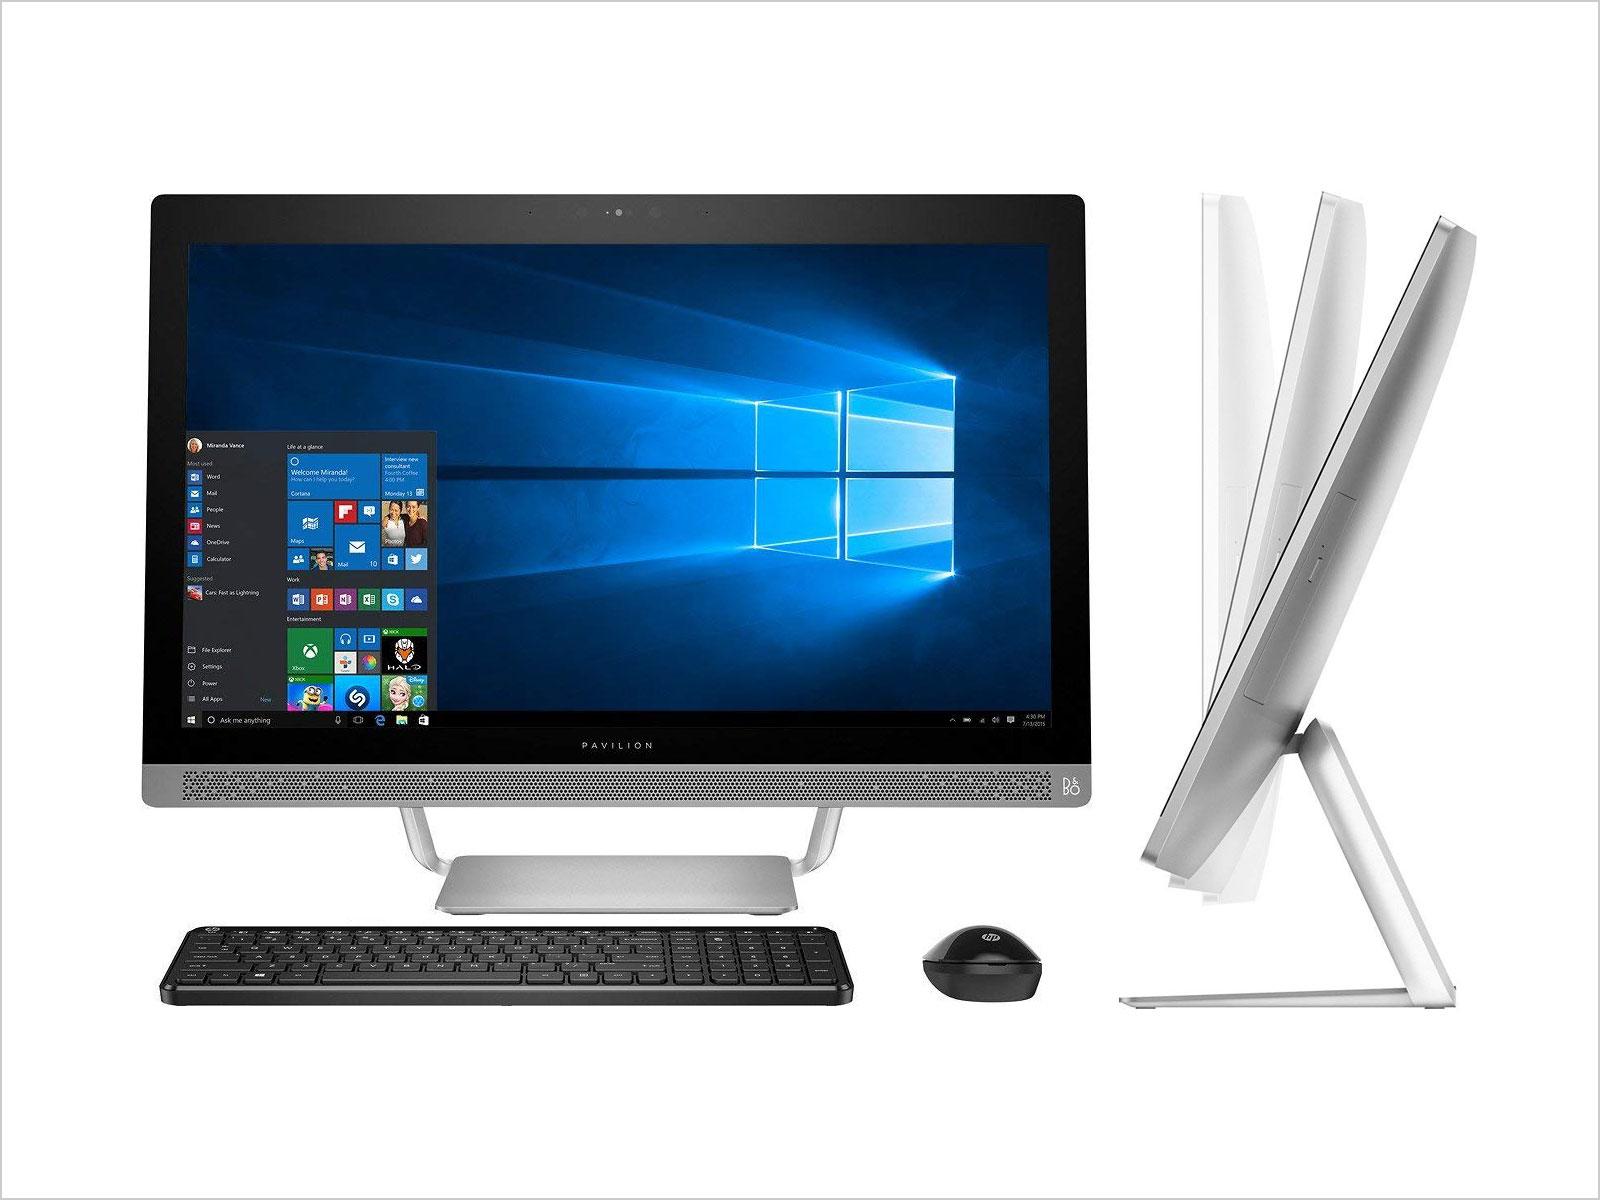 Premium-HP-Pavilion-27-Full-HD-IPS-Touchscreen-All-in-One-Desktop